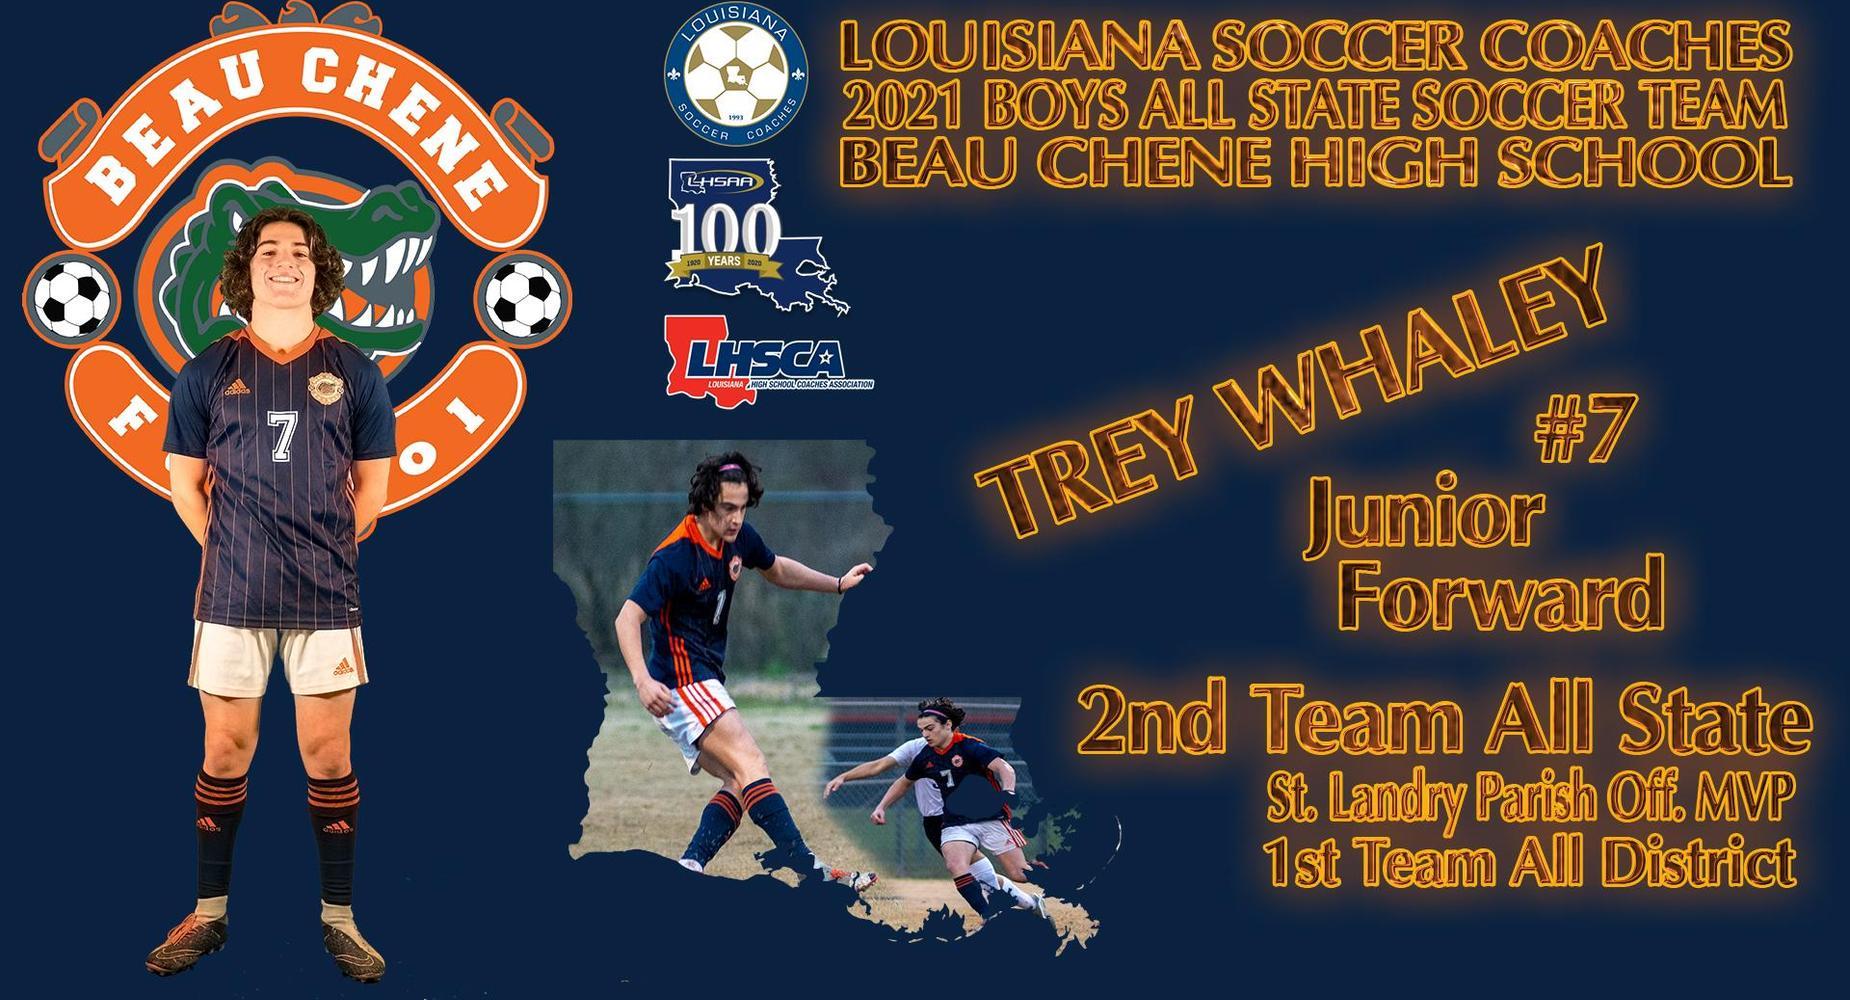 LHSSA Soccer Coaches Boys All State Soccer Team